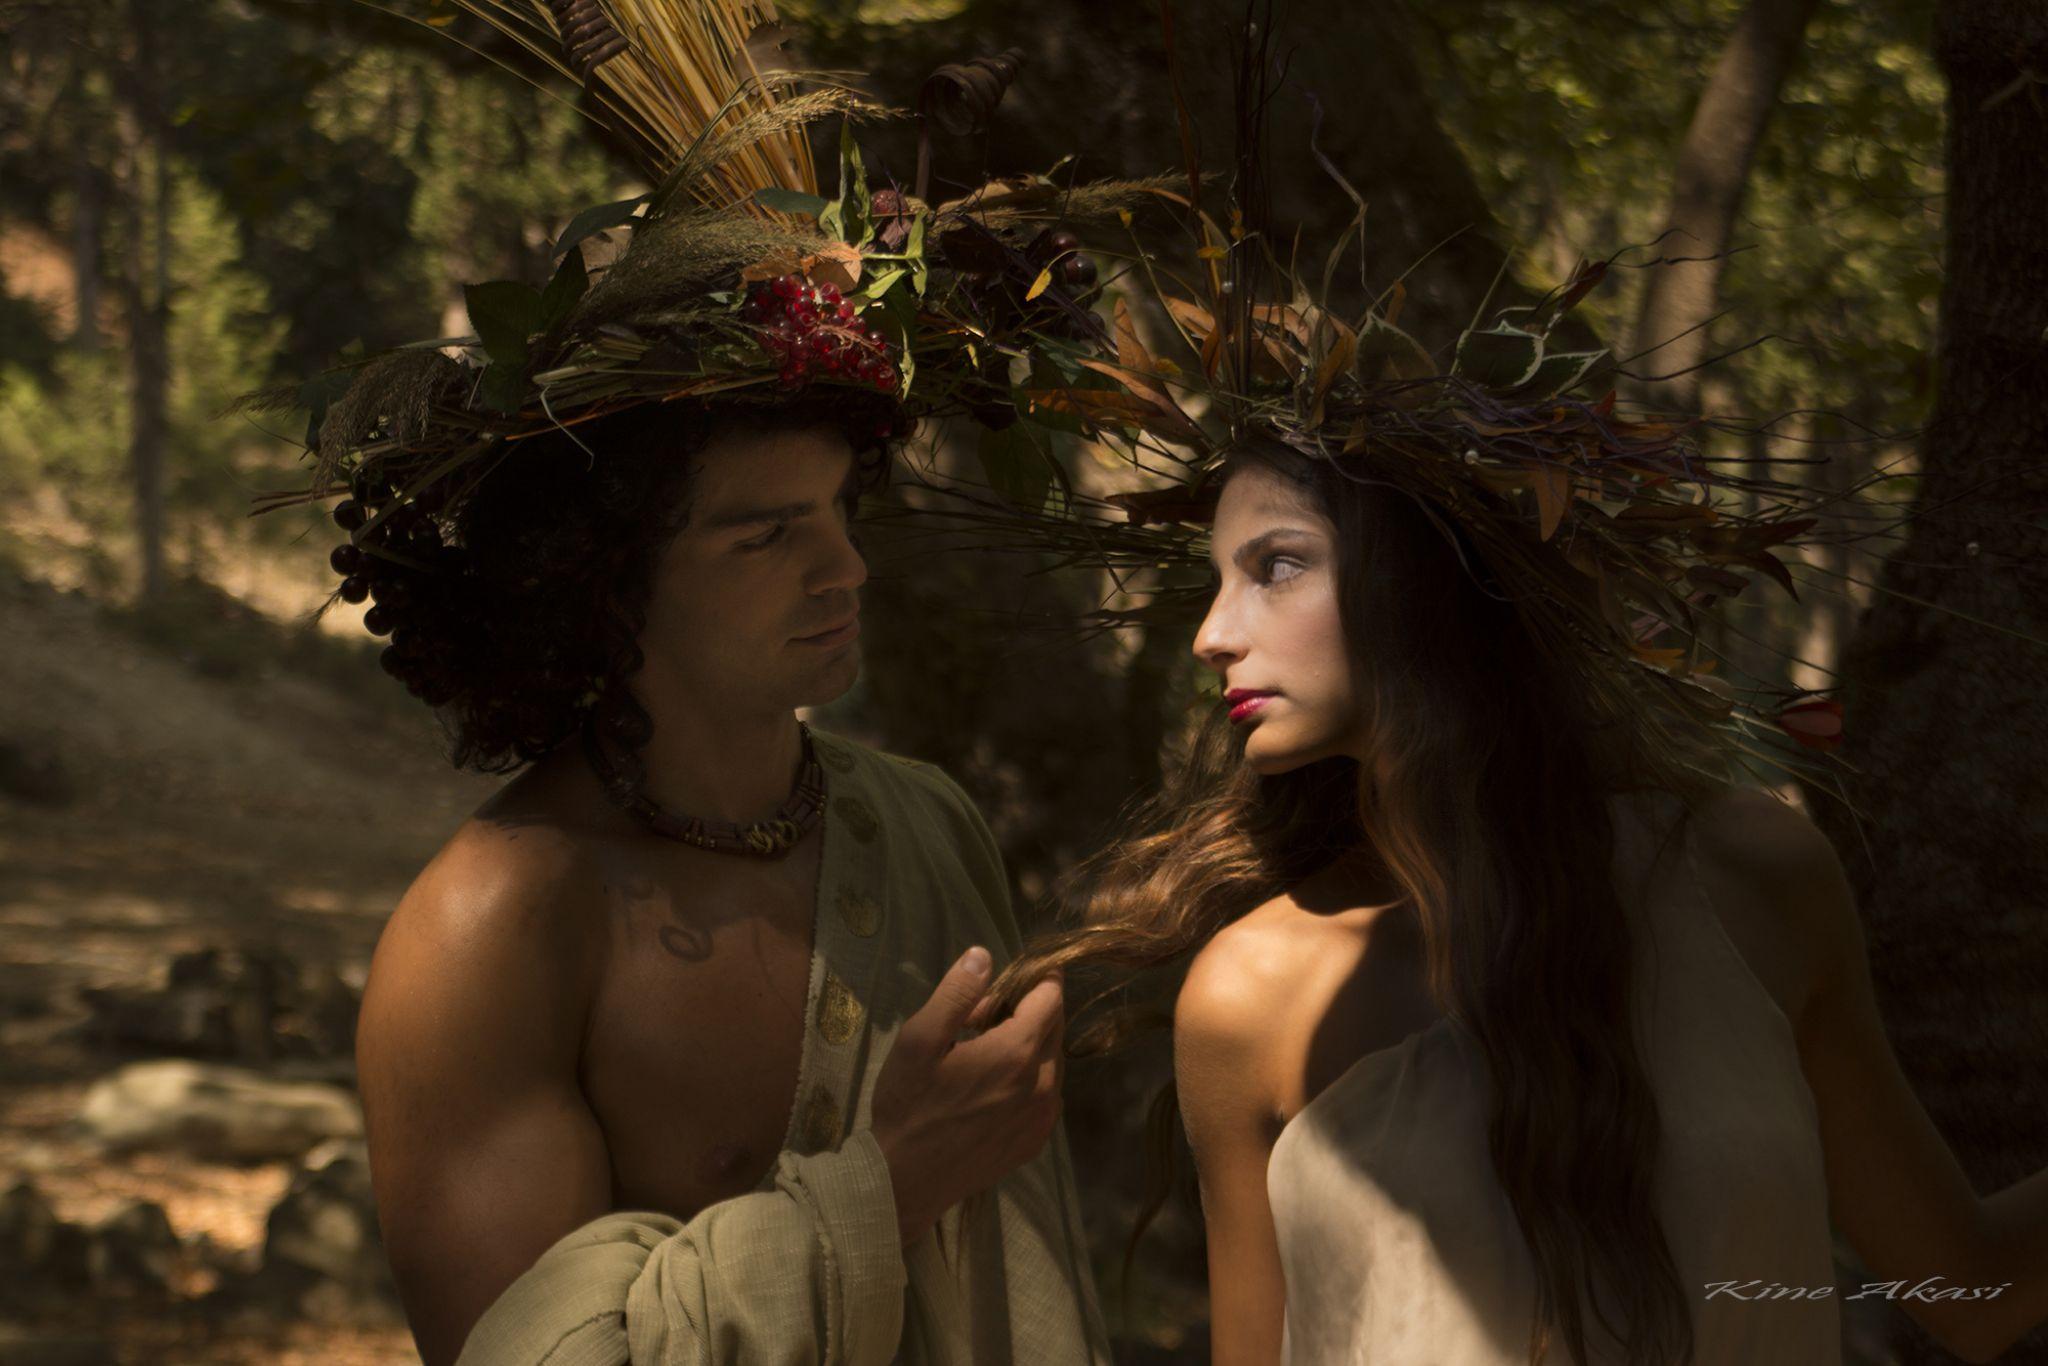 Dionysus and Naiad by KineAkasi